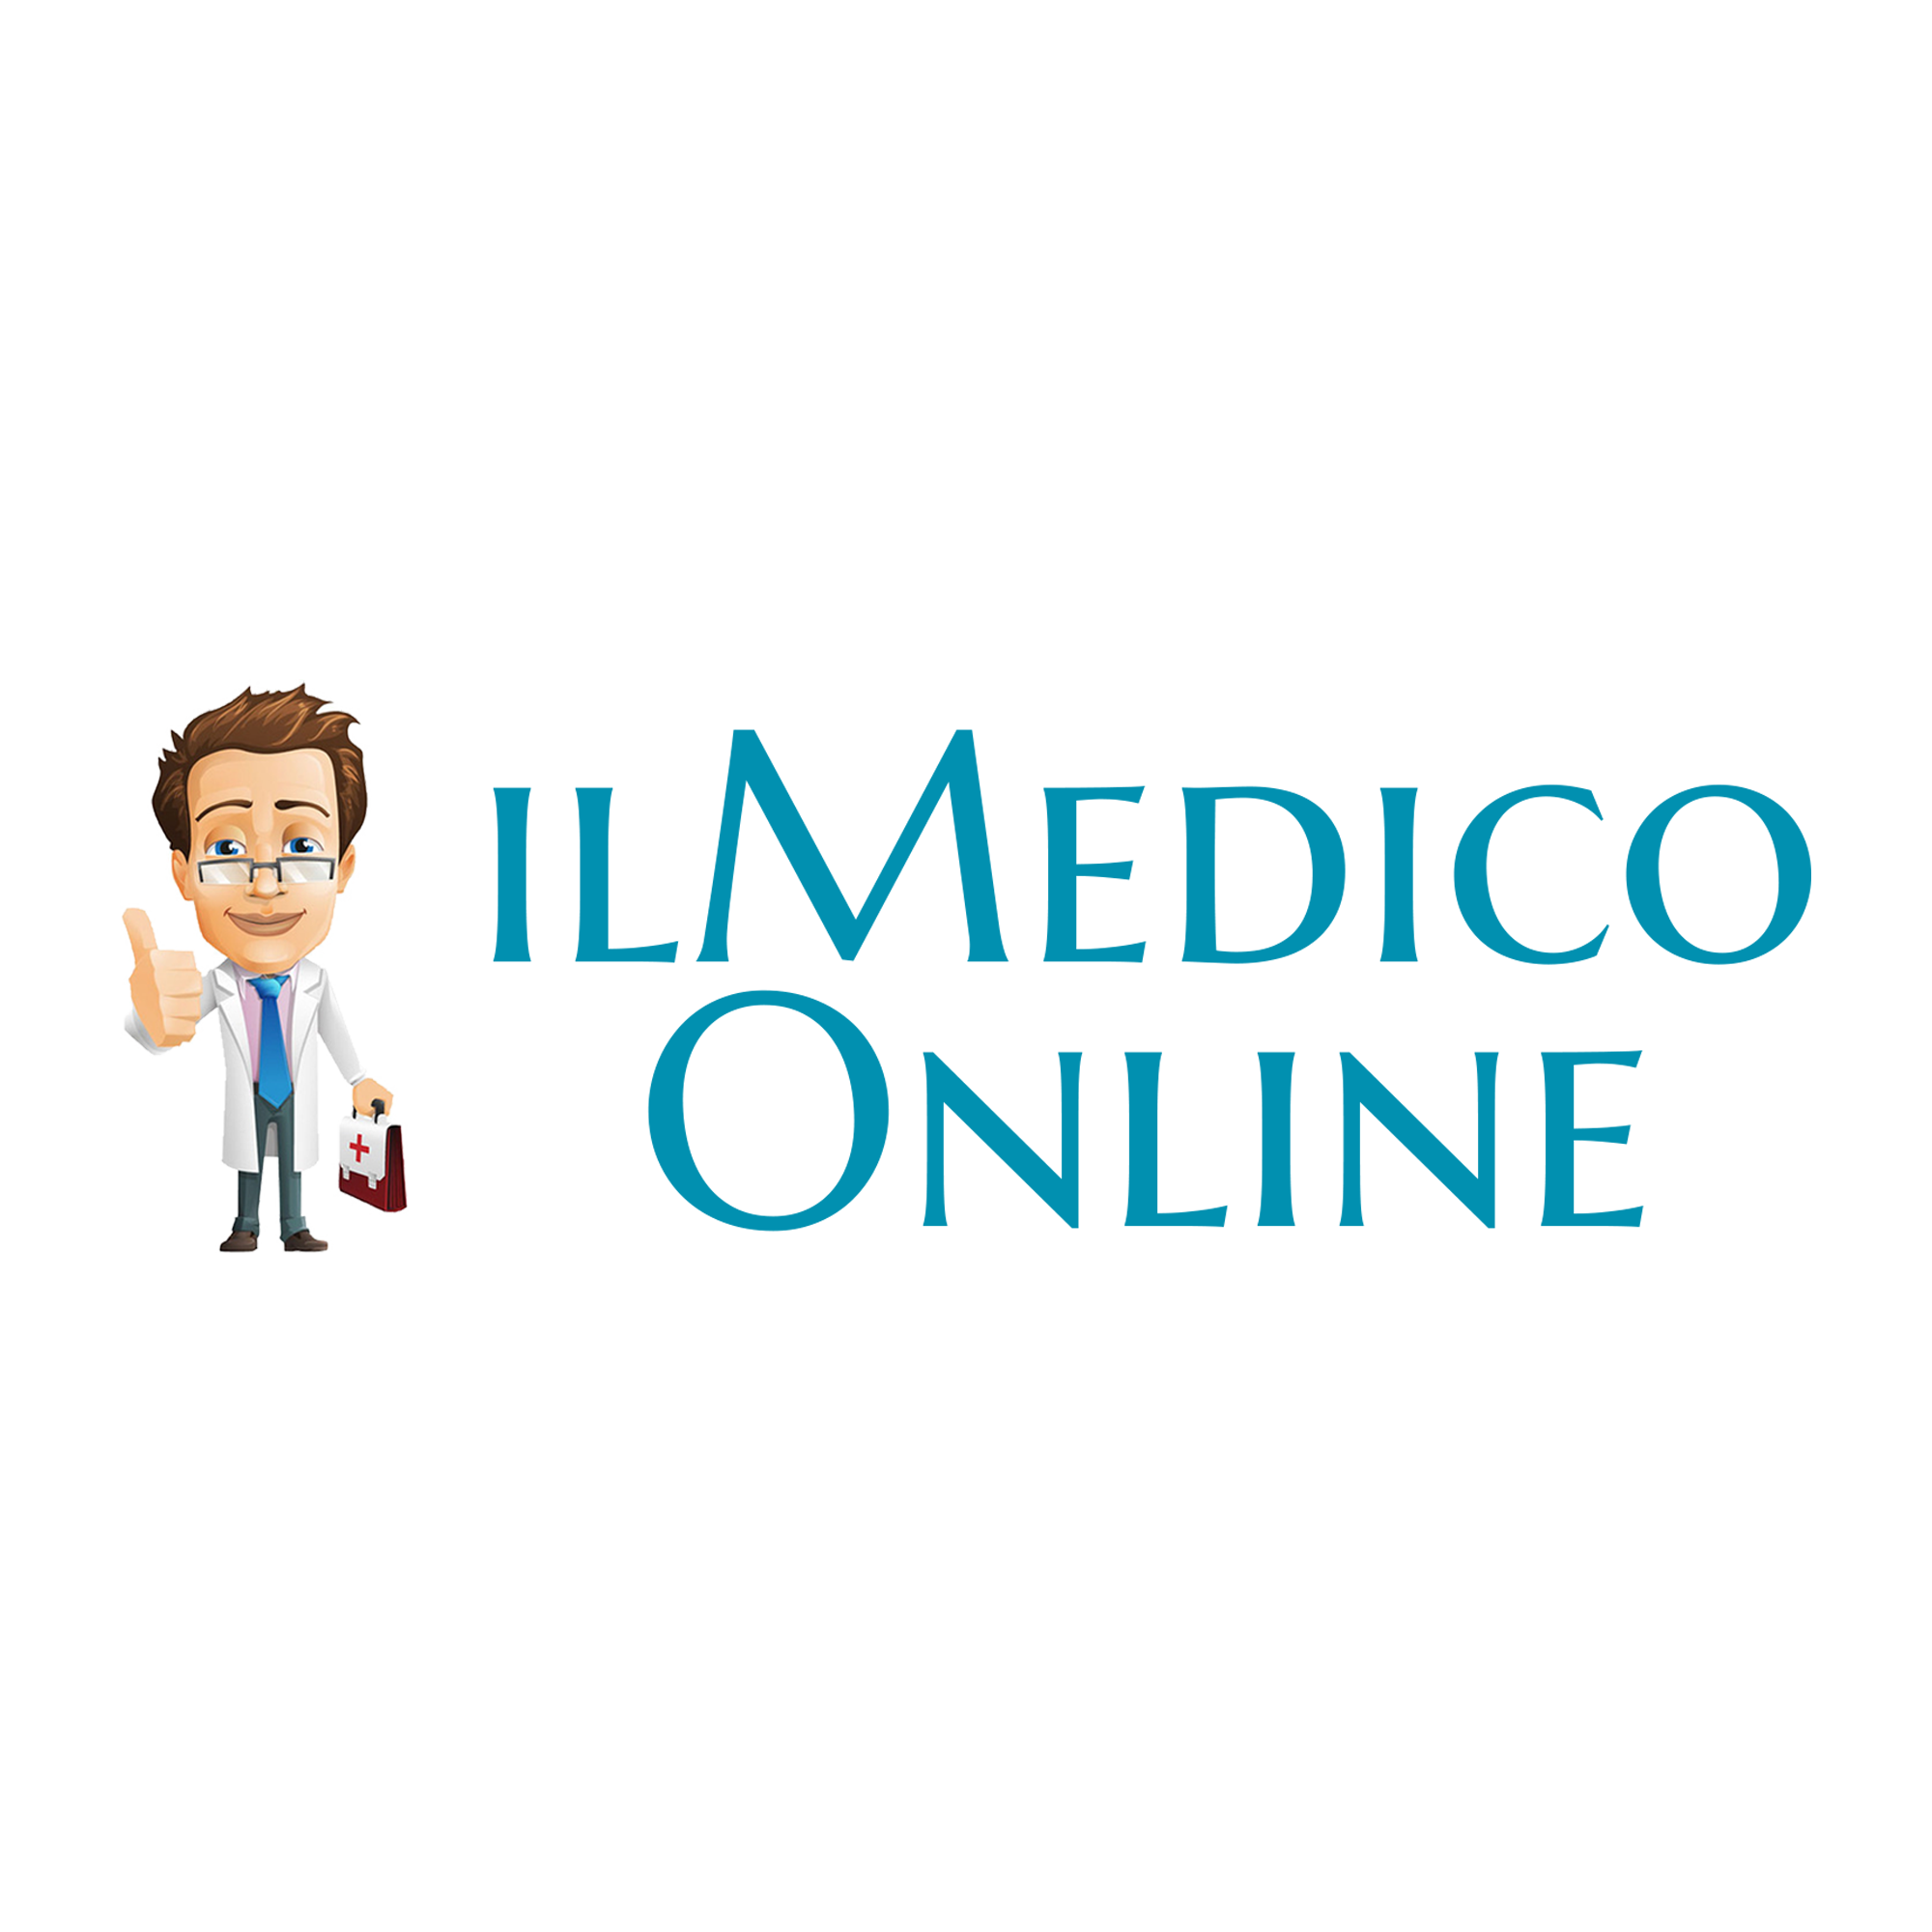 ilmediconline